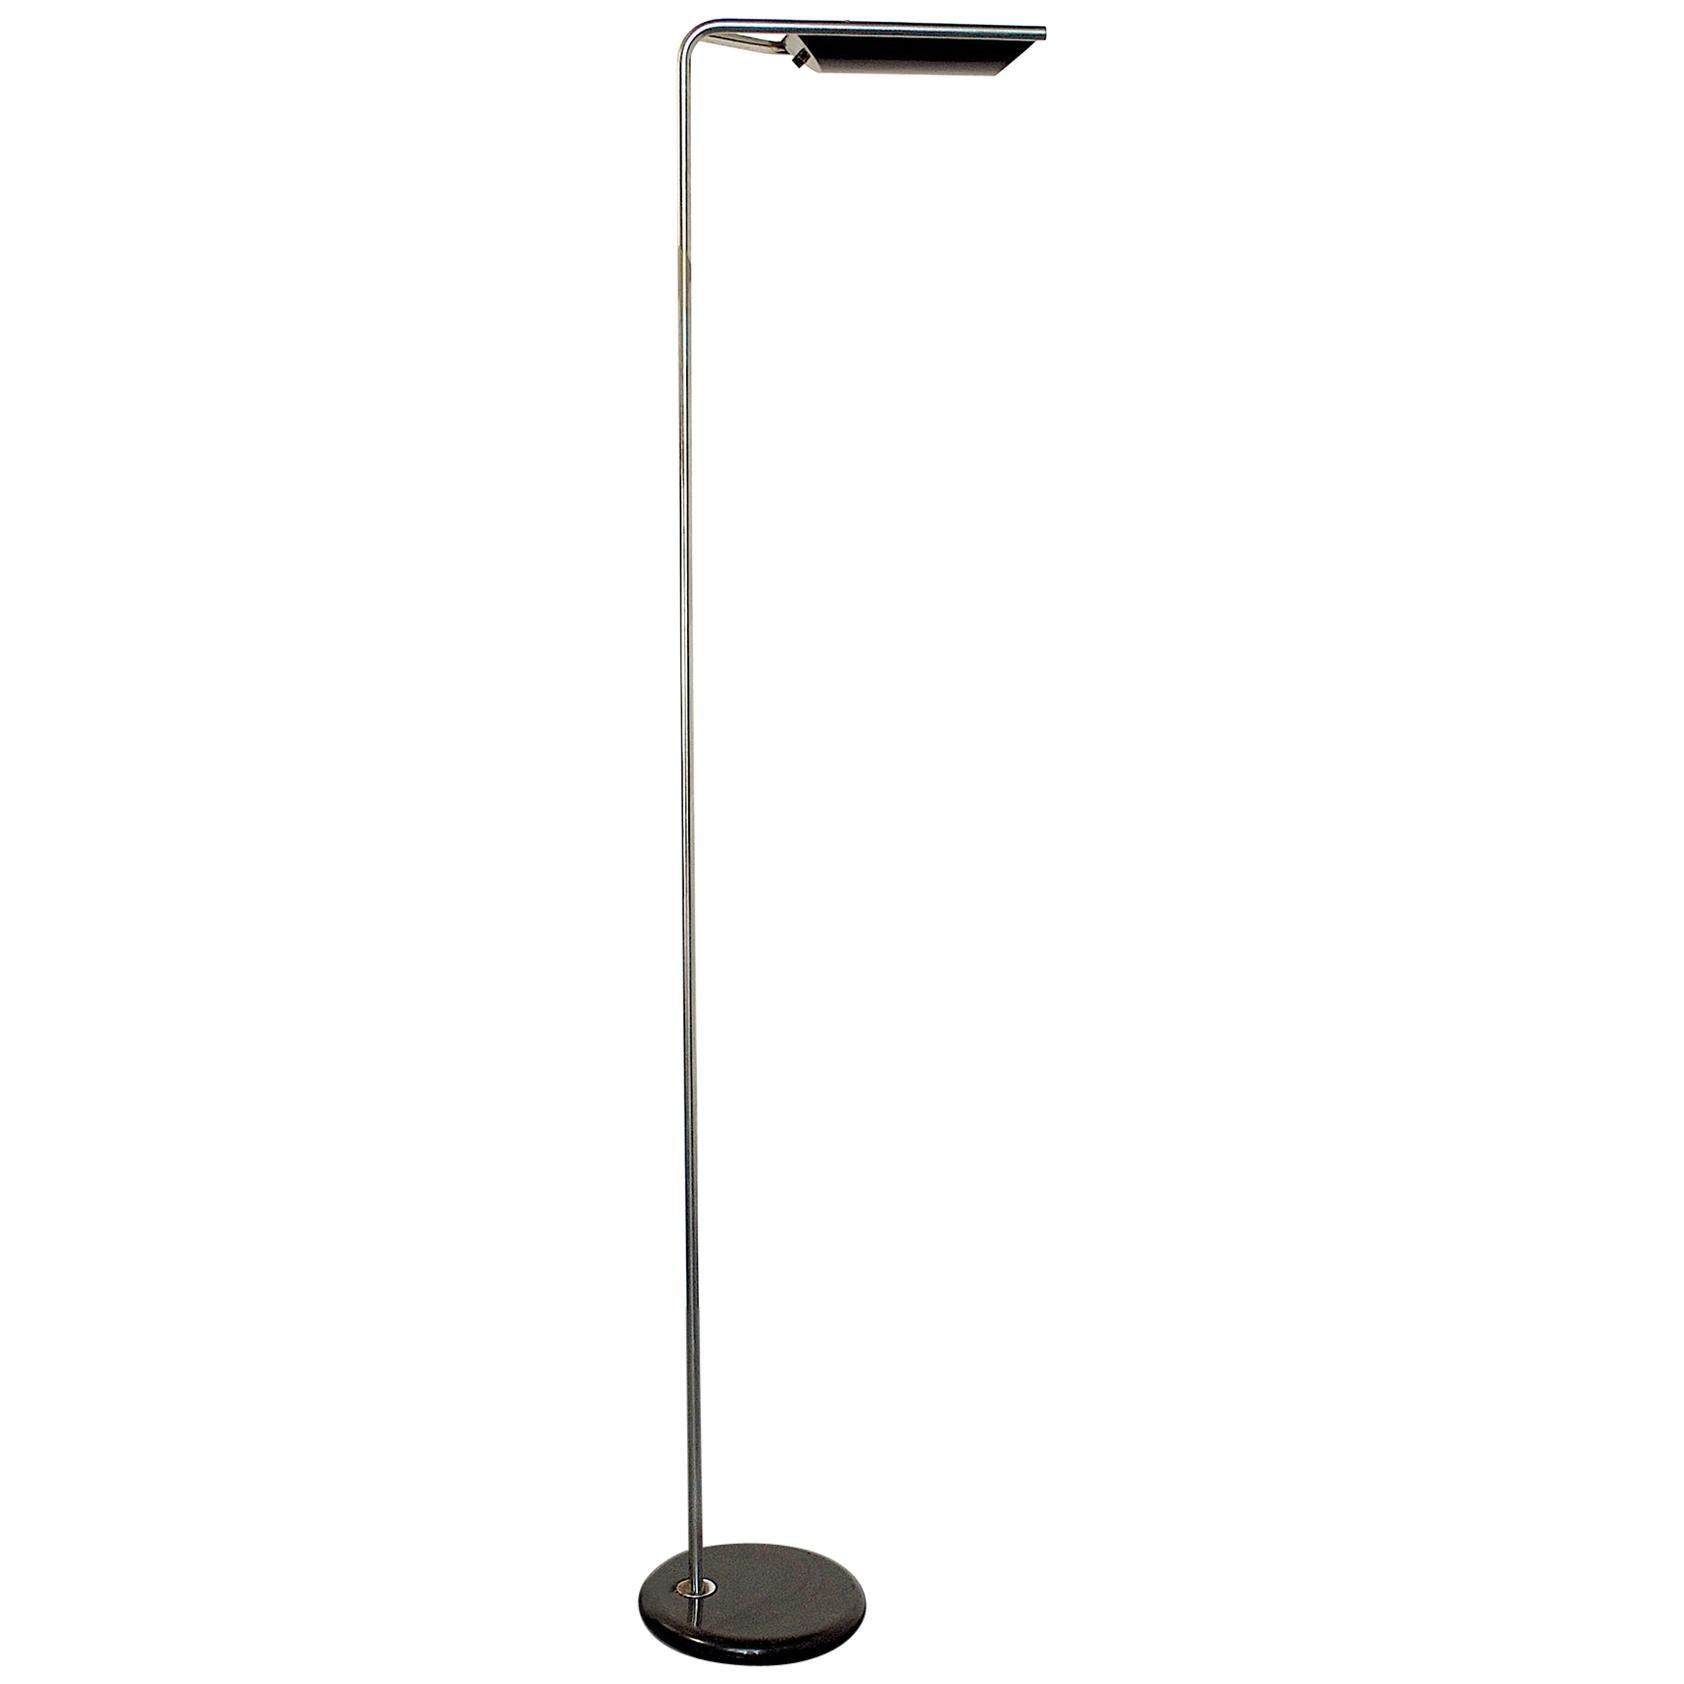 Bruno Gecchelin Italian Midcentury Floor Lamp